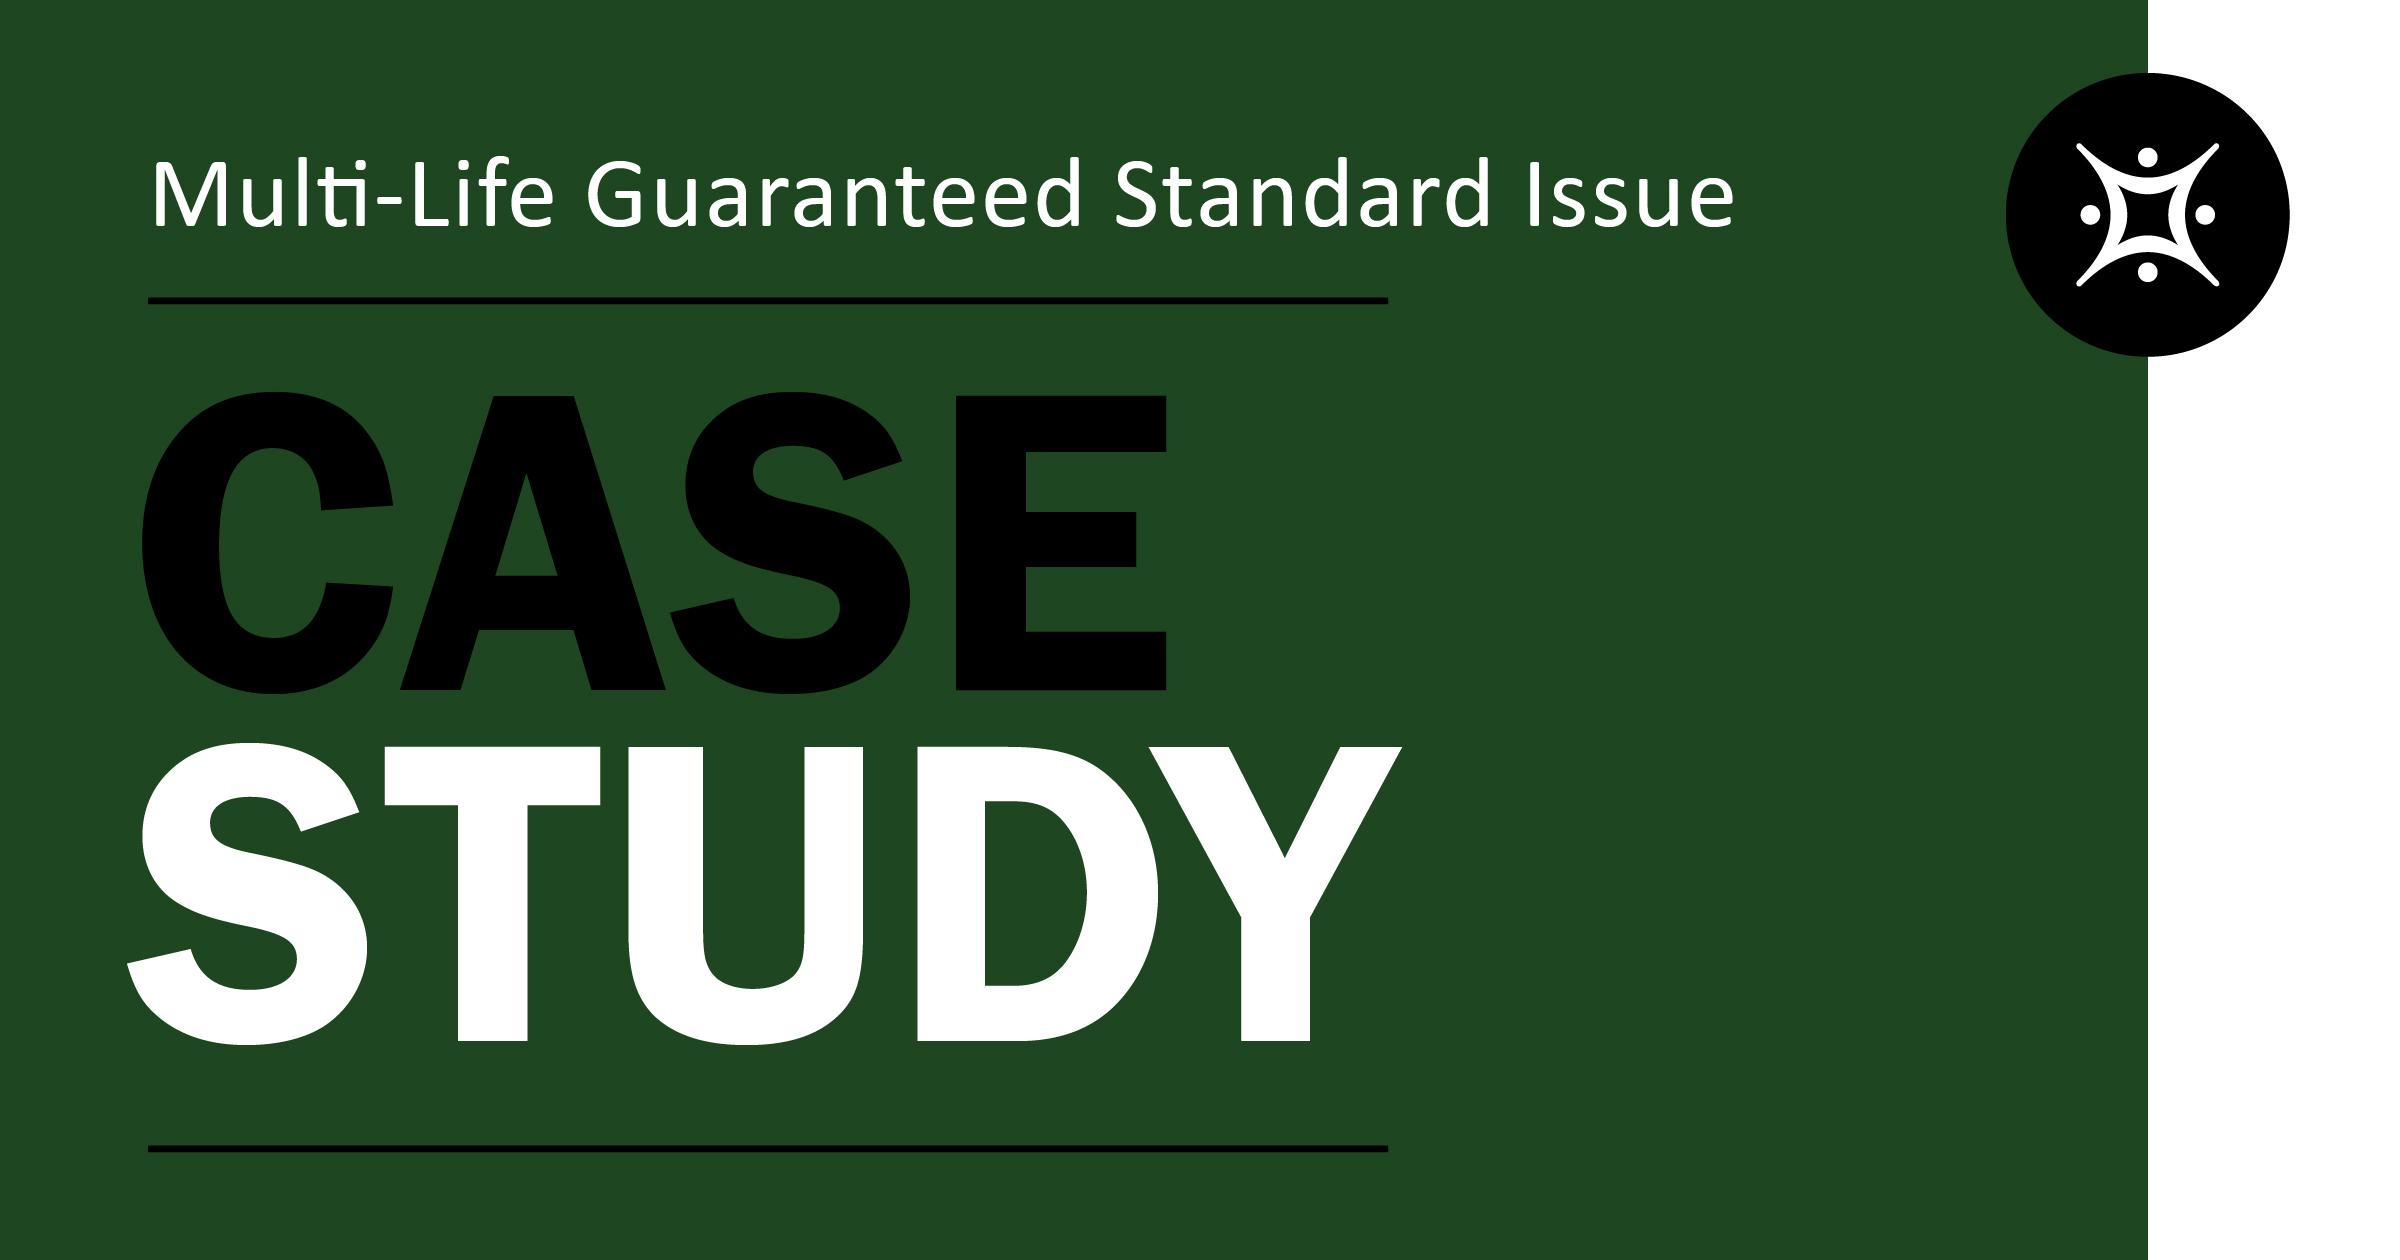 Case Study: Multi-Life Guaranteed Standard Issue